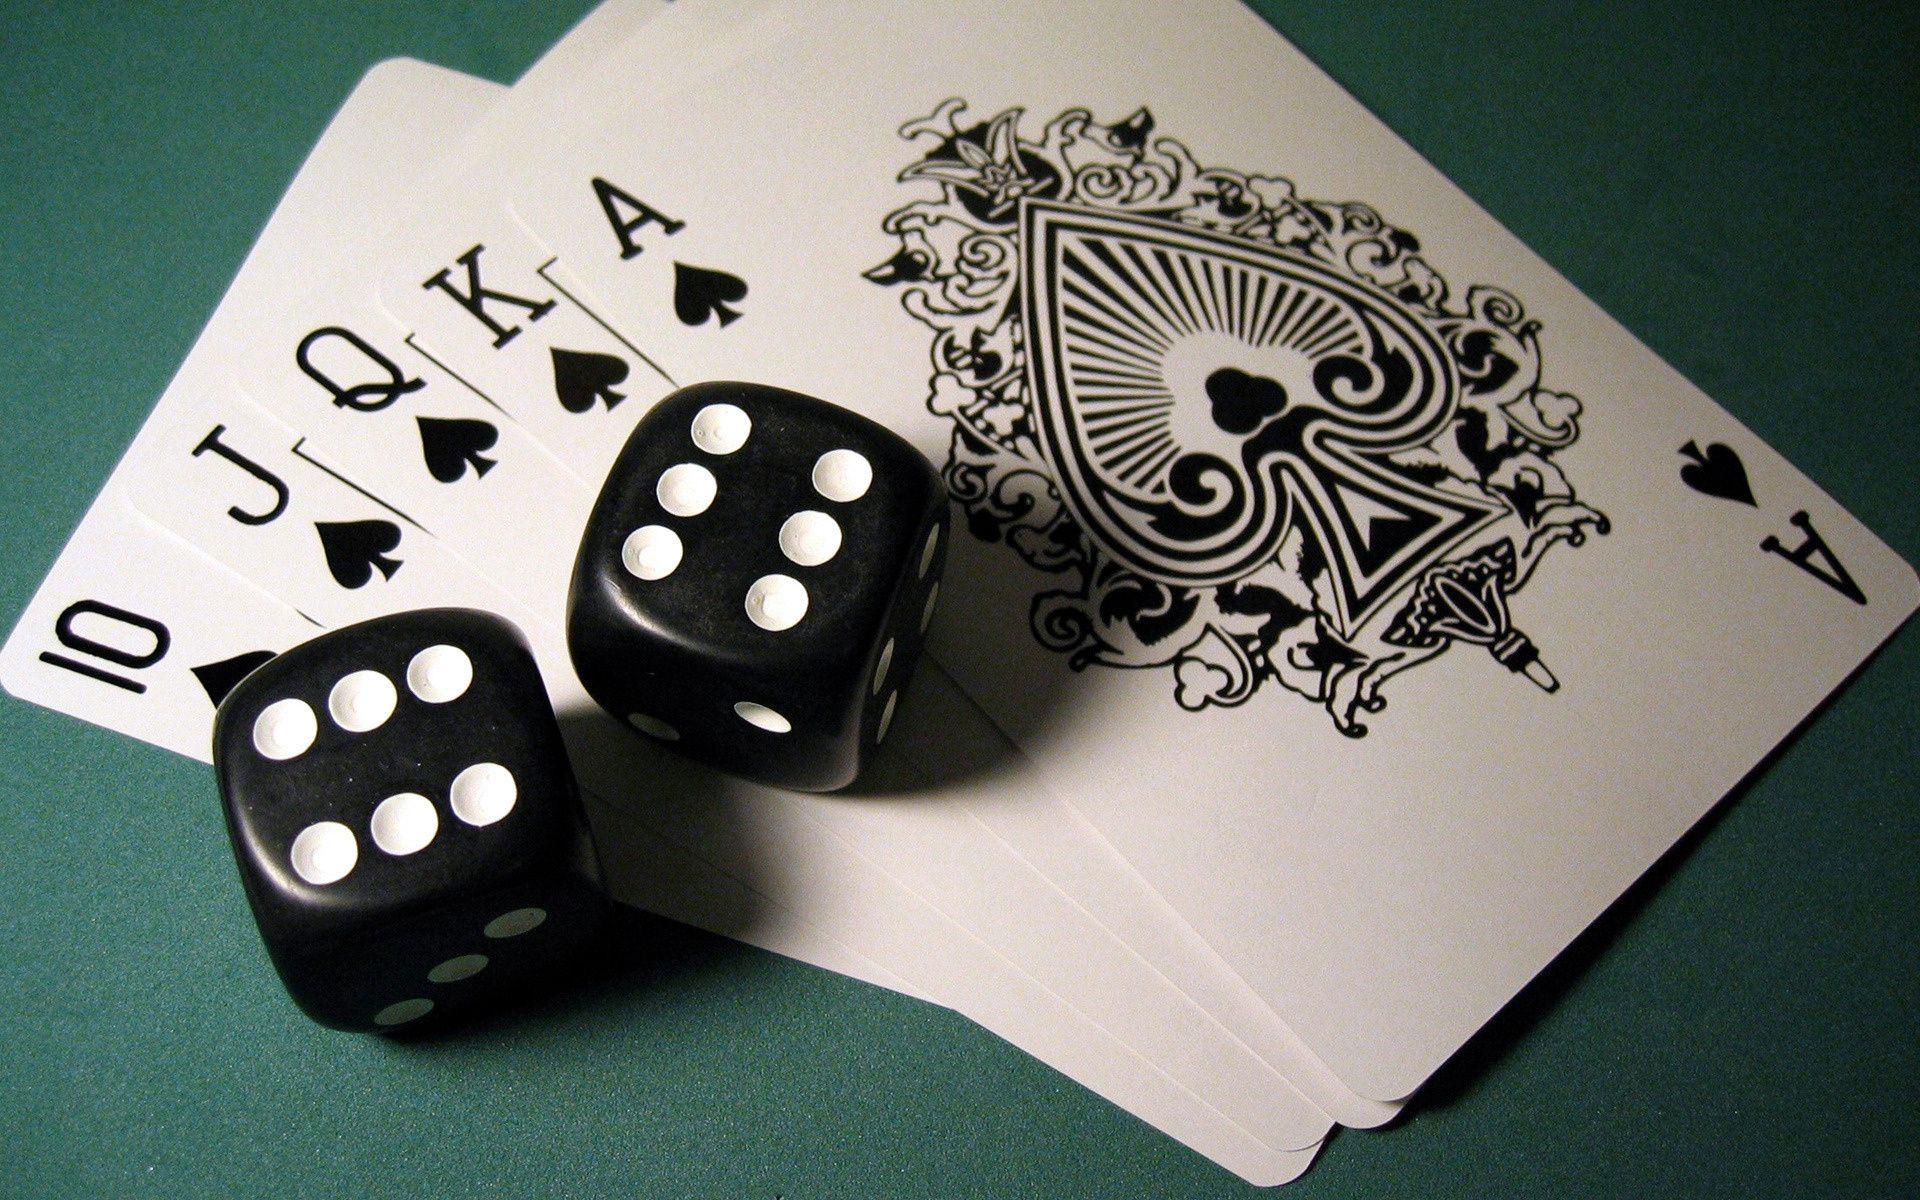 True Method For Gambling In Step-by-step Detail